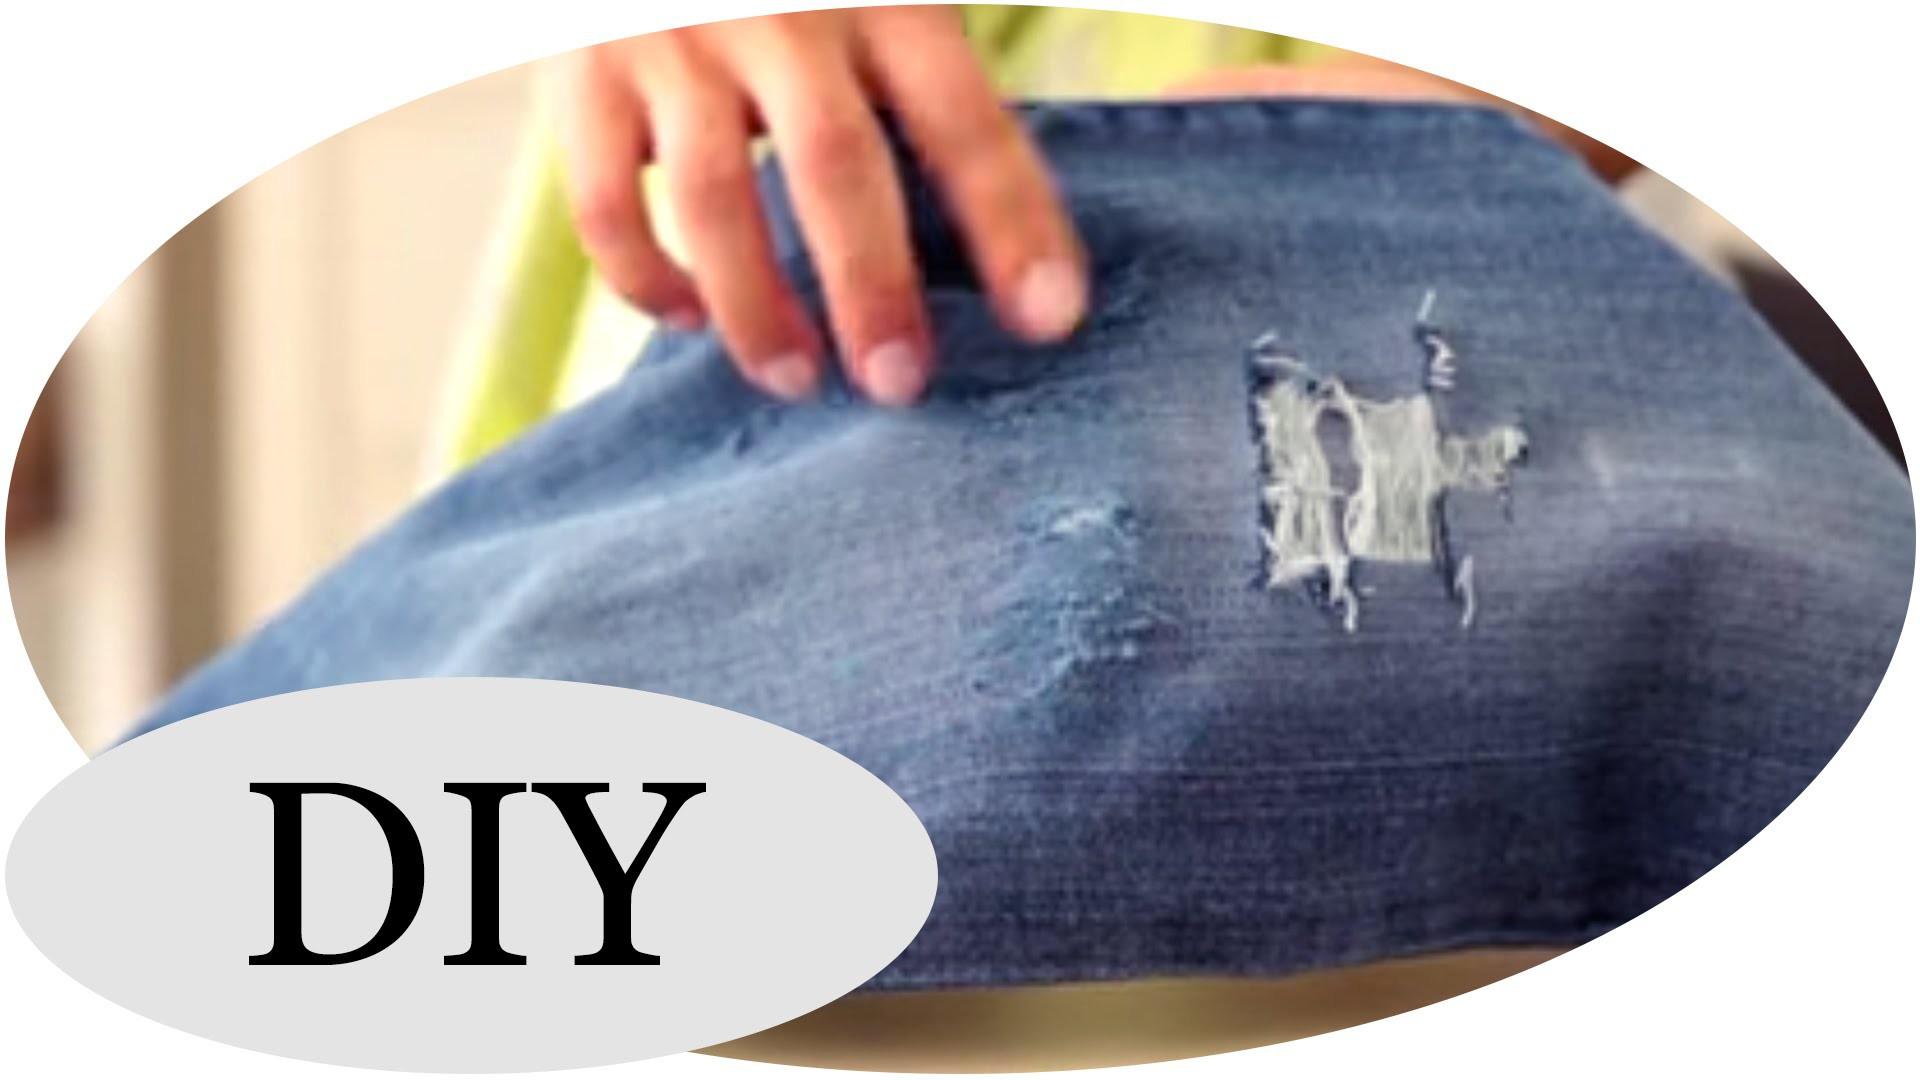 DIY: Coole Destroyed Jeans selber machen - TUTORIAL